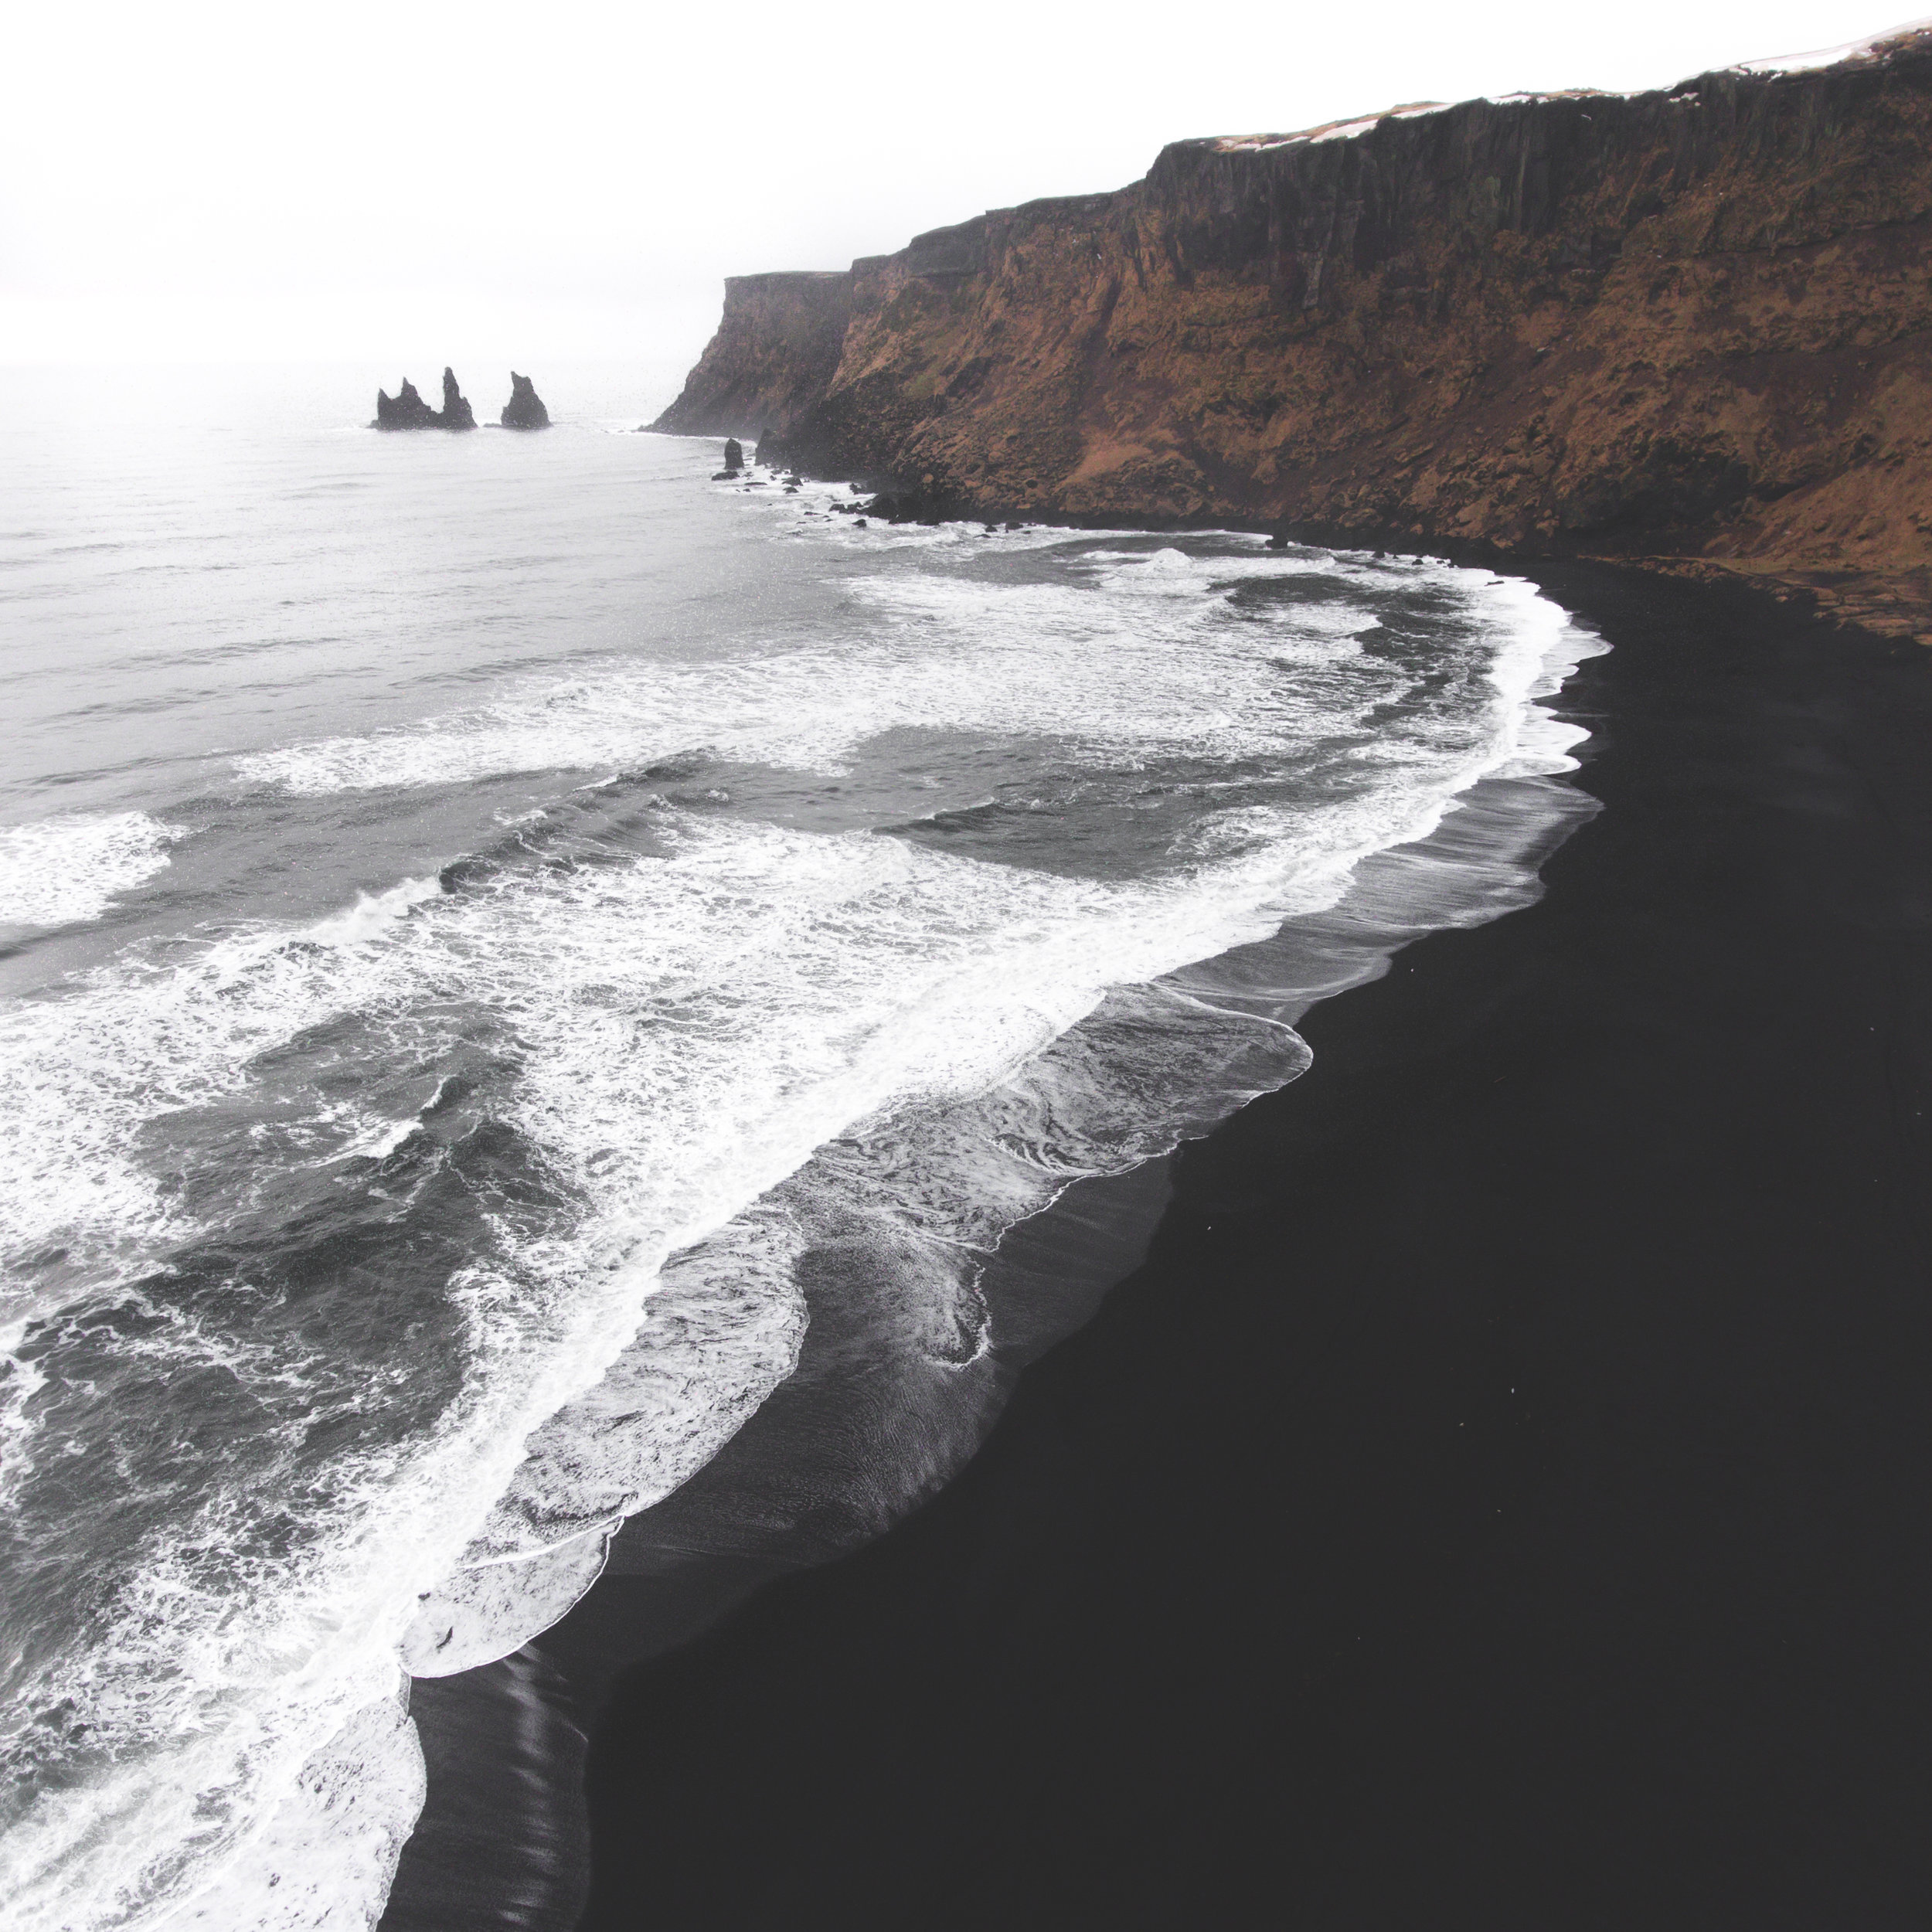 Joe Shutter Iceland Does Instagram Kill Creativity?